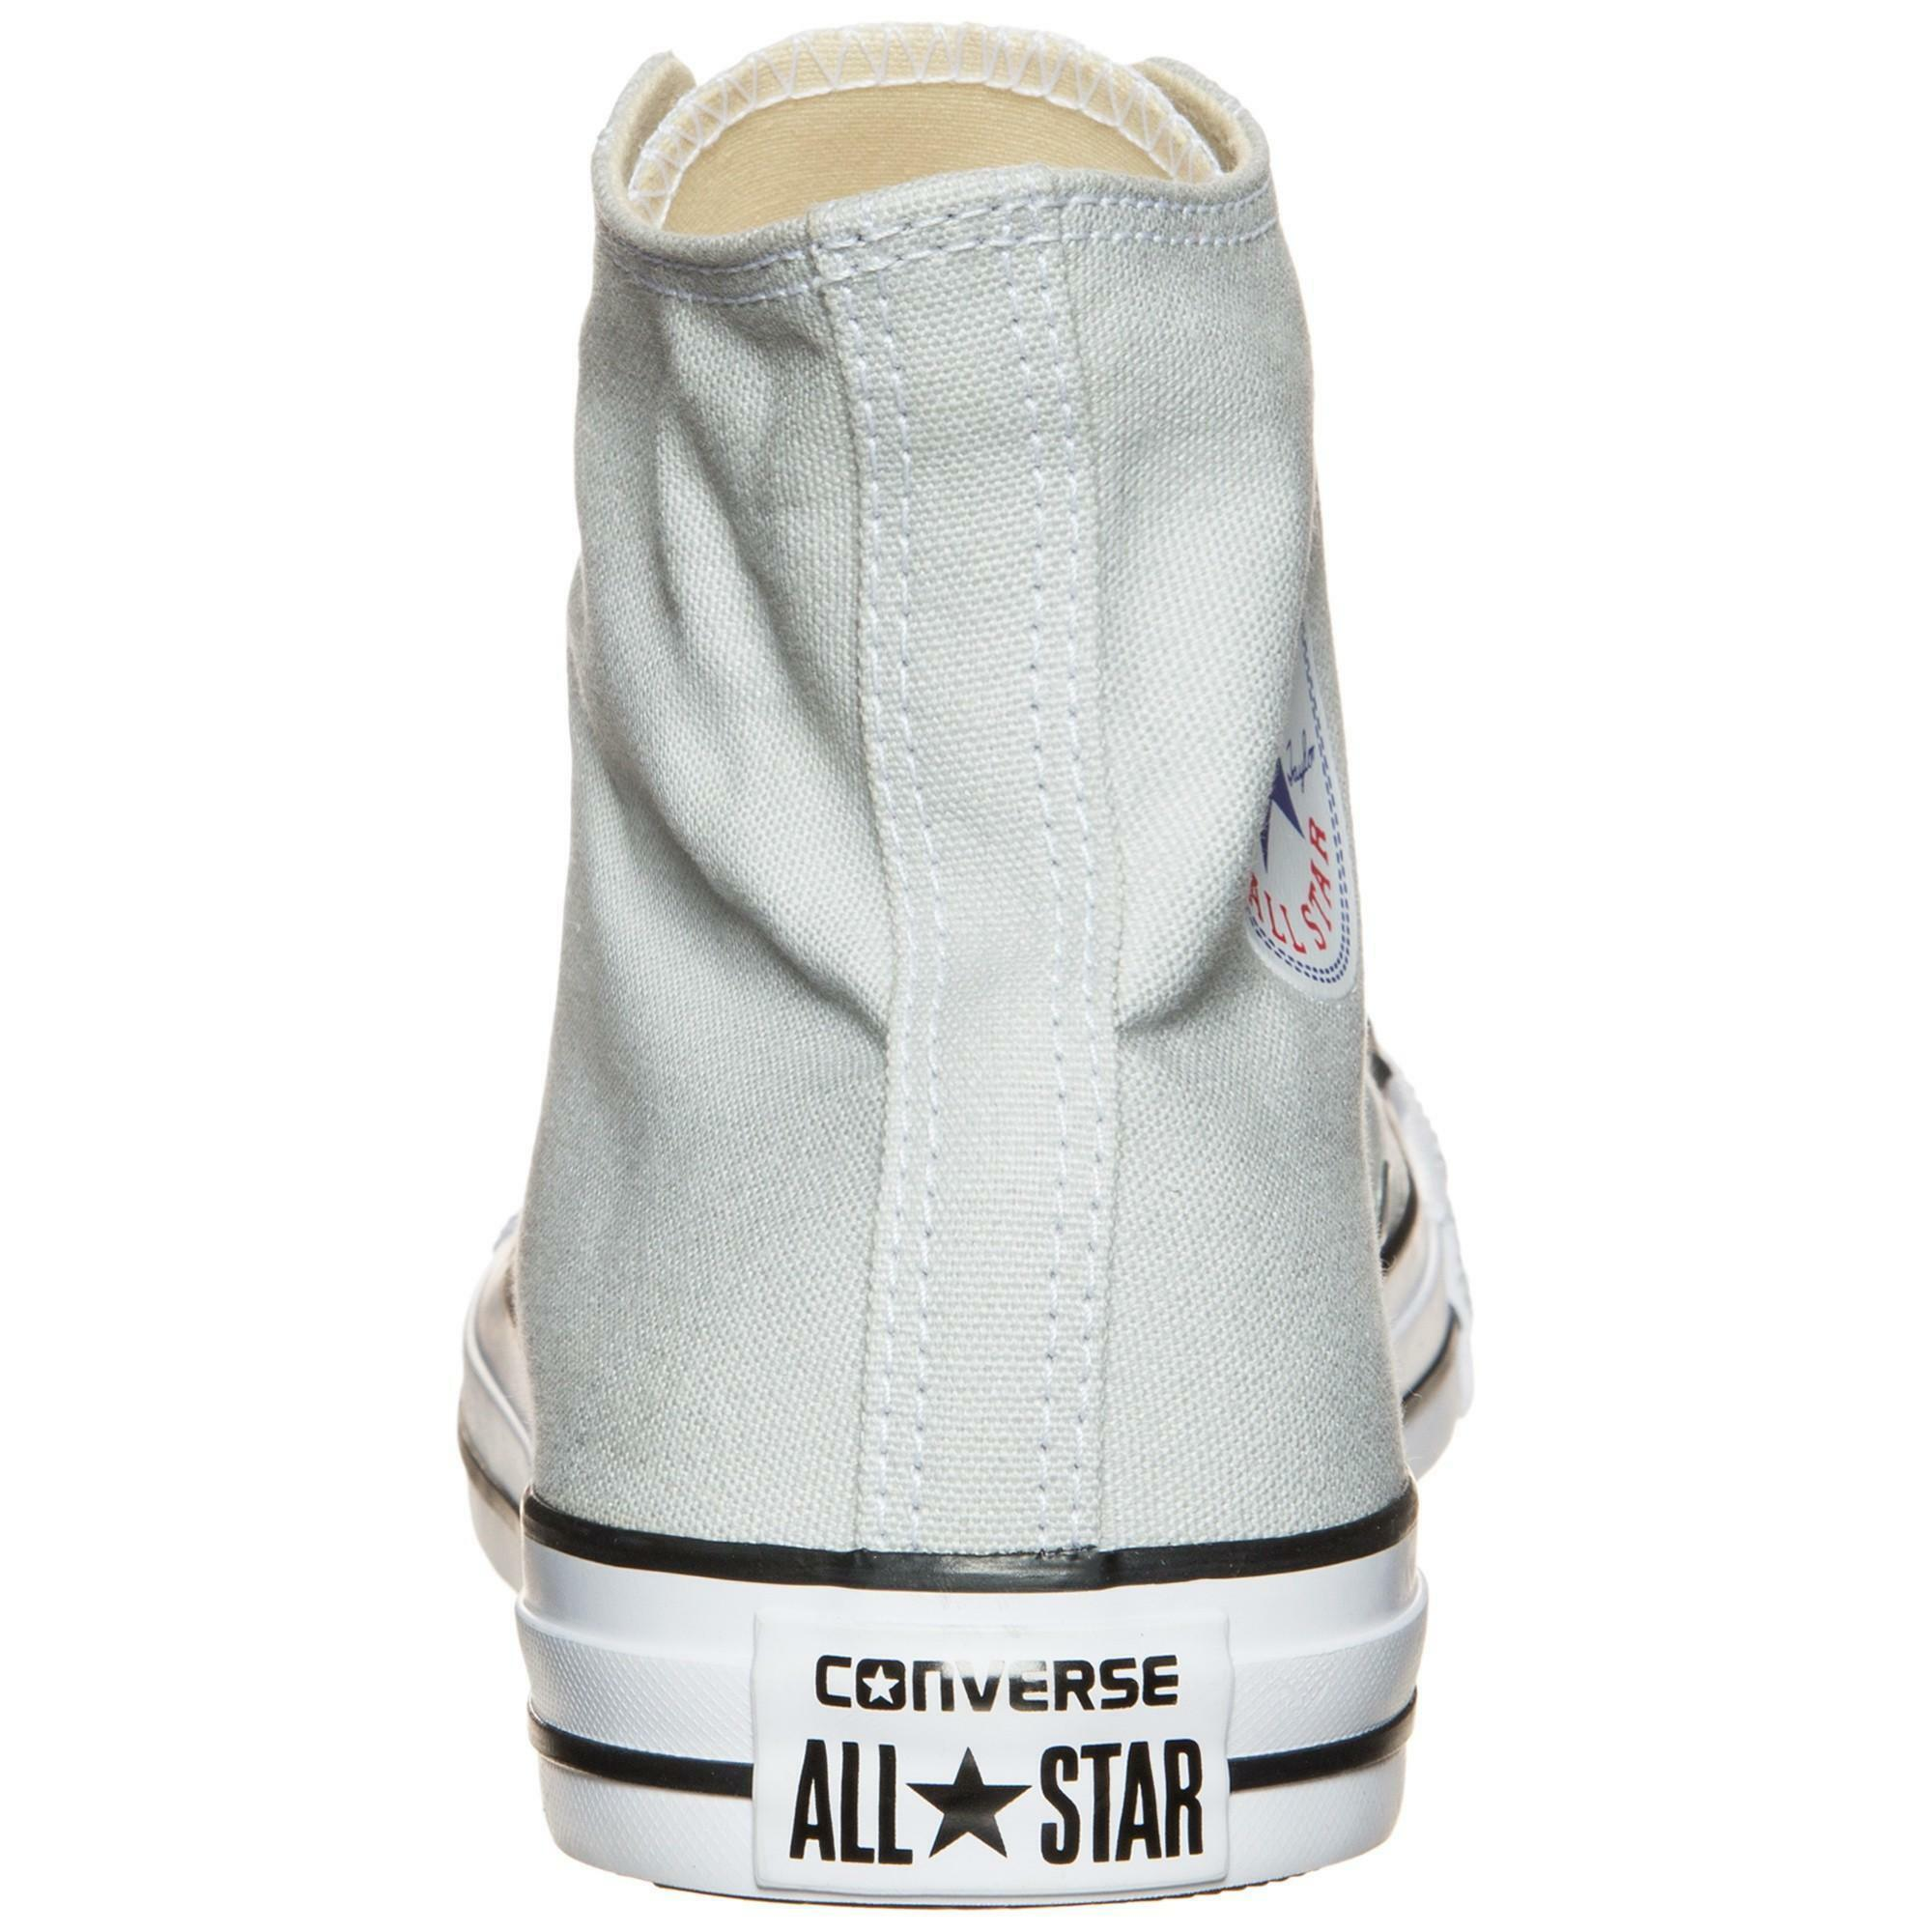 converse converse all star chuck tylor hi scarpe sportive uomo tela grigie 151170c